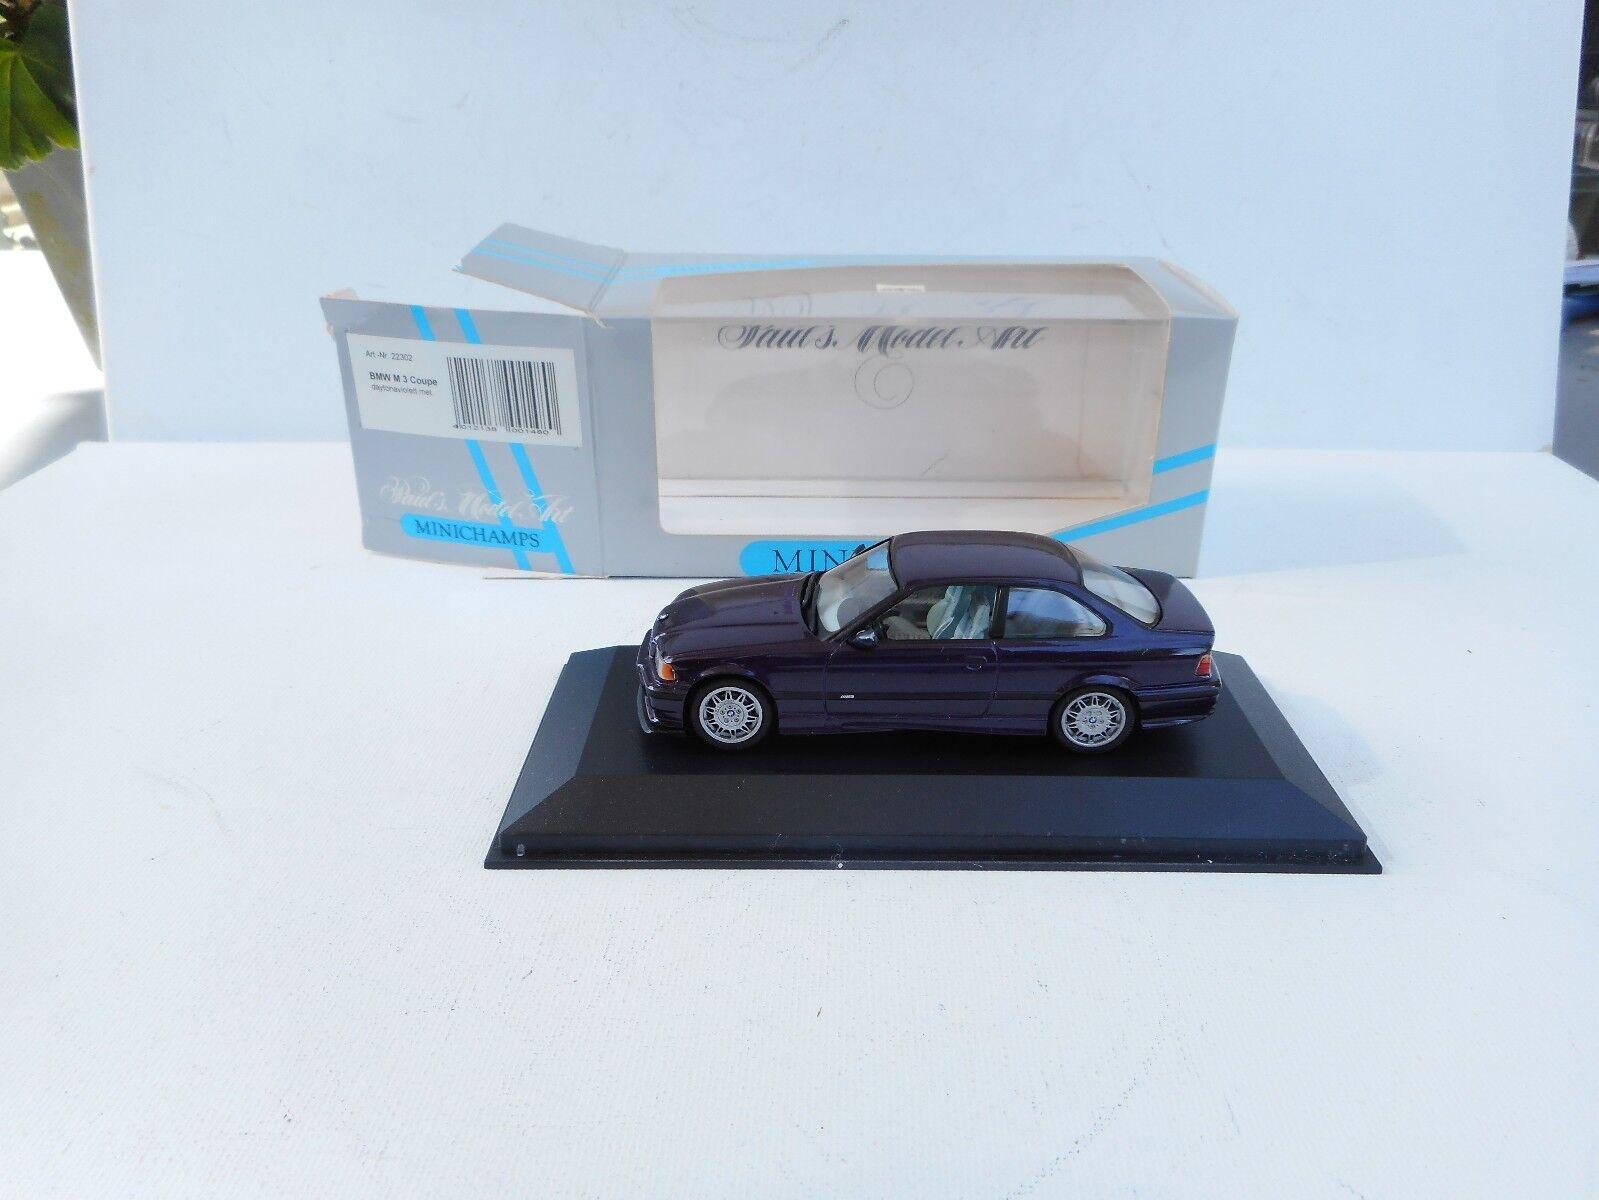 para proporcionarle una compra en línea agradable BMW 3 Serie E36 M3 Coupe Coupe Coupe Daytonapúrpurat Color  Minichamps 1 43  Neu OVP    autorización